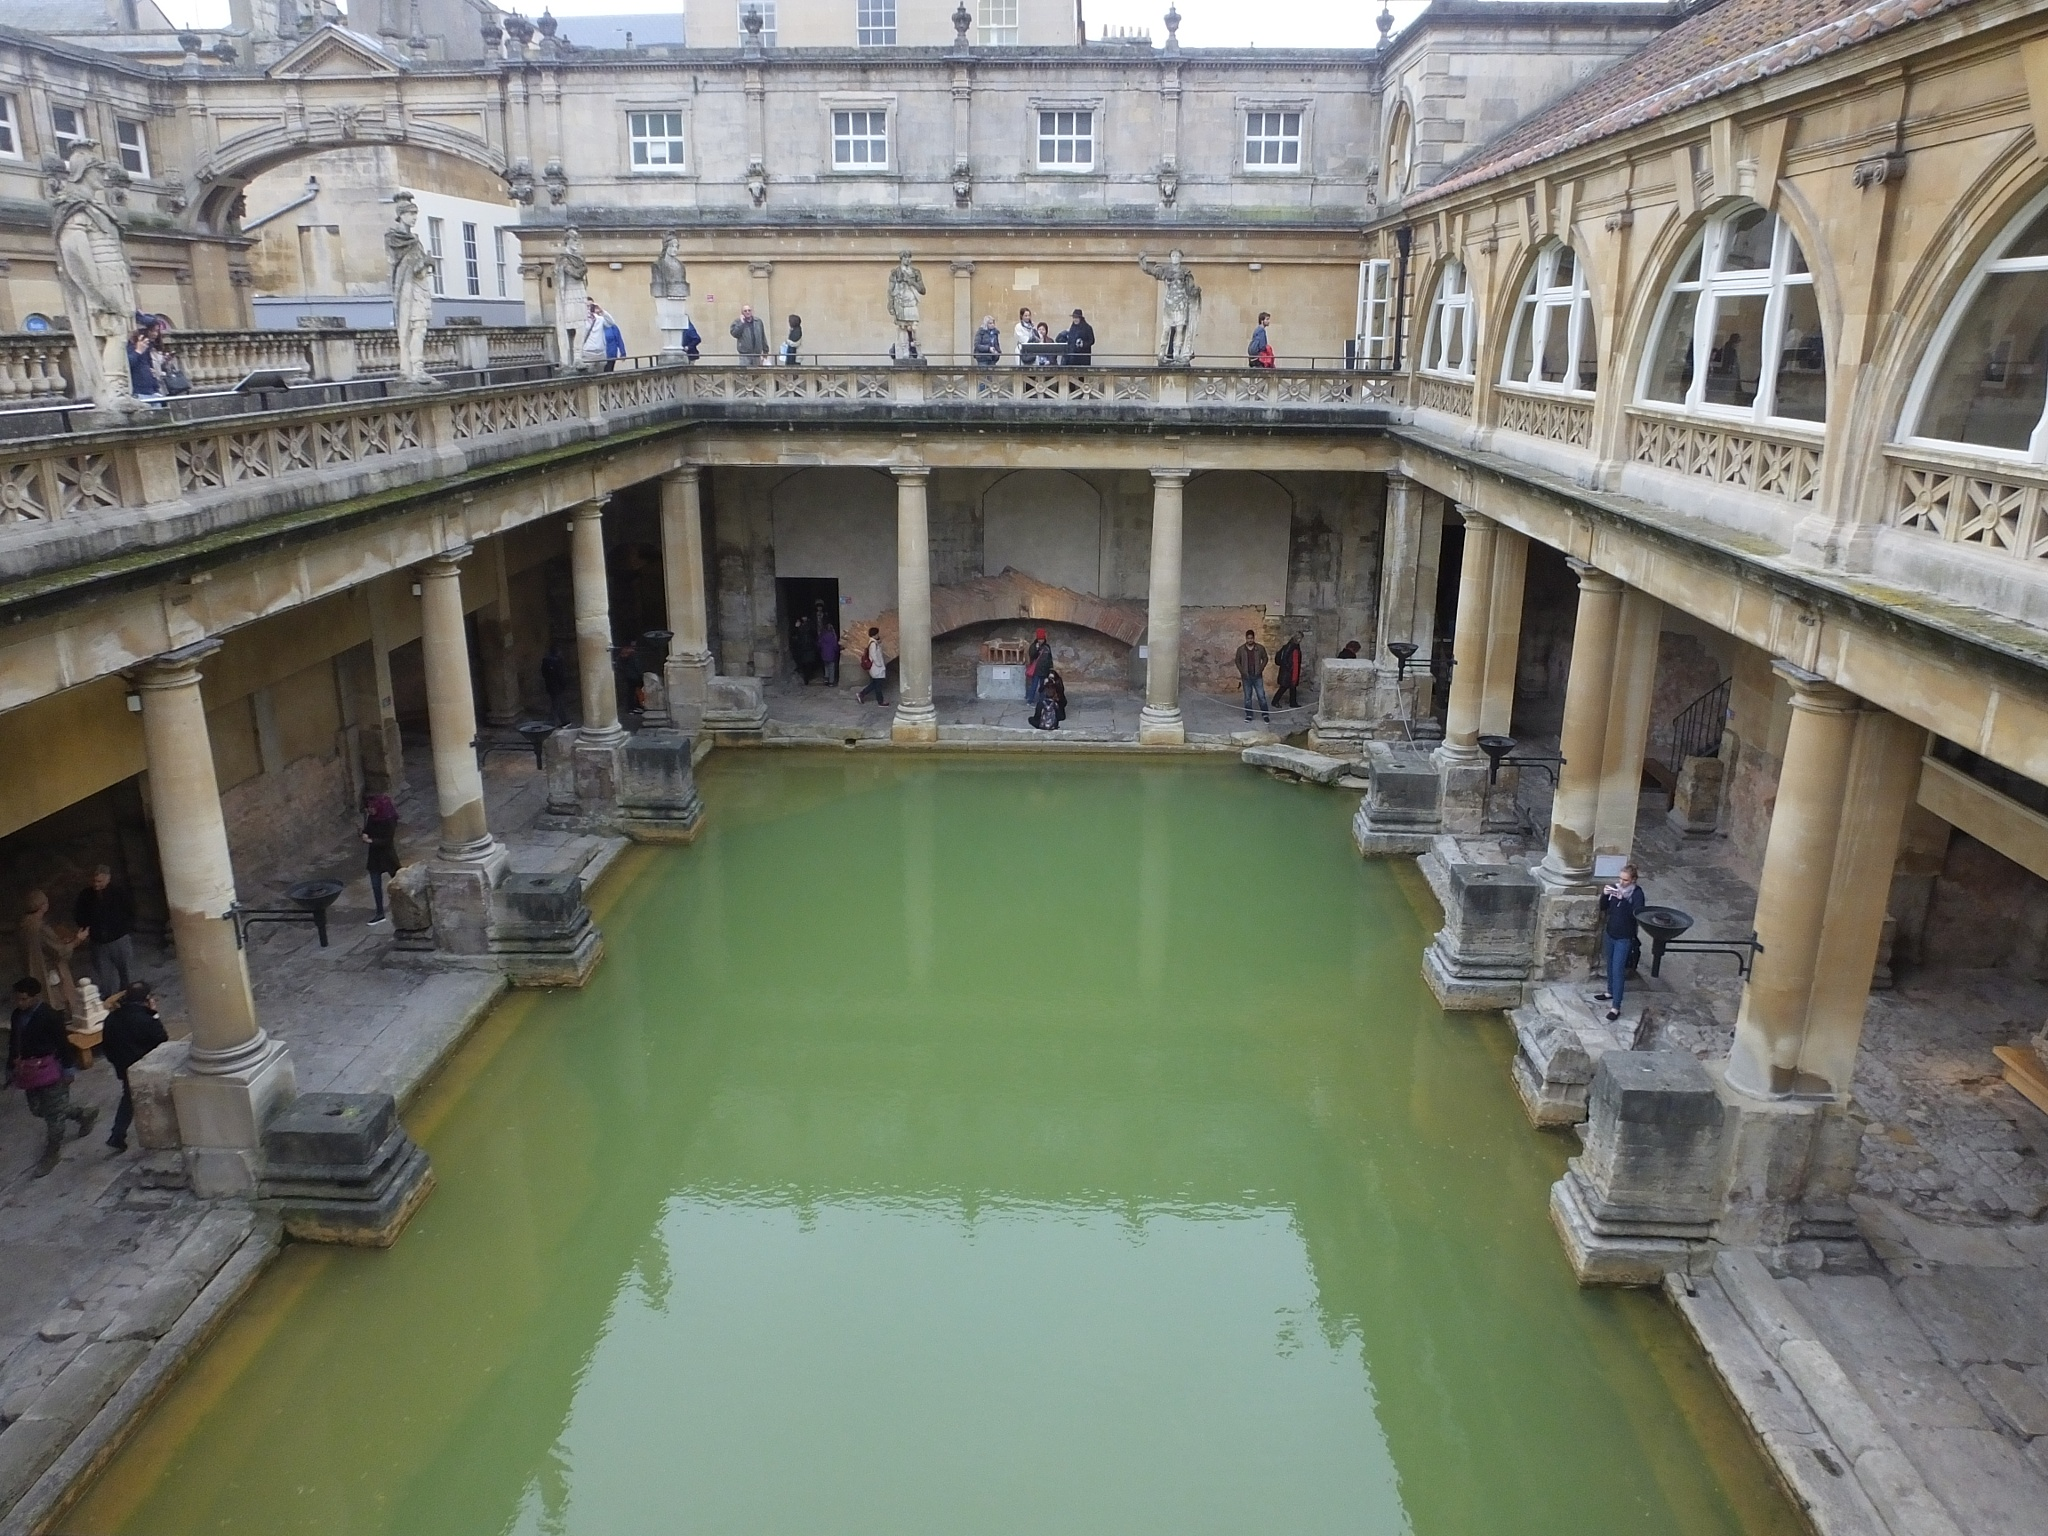 Roman Baths by Dave Turner